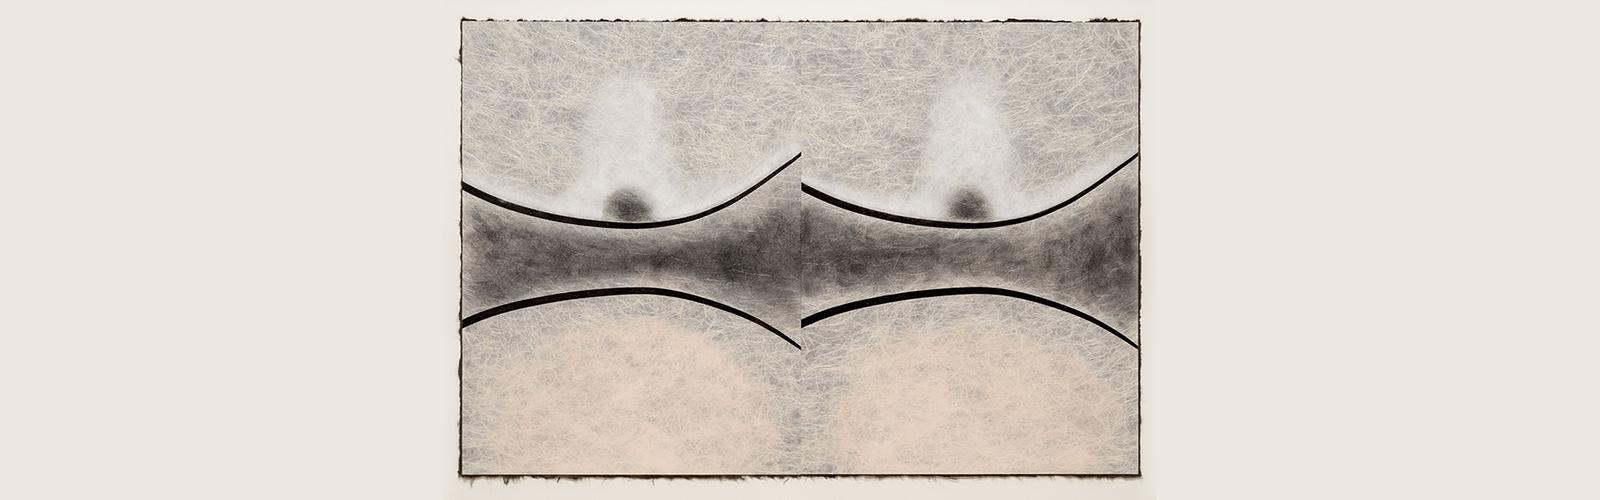 Nickle New: Robin Arseneault